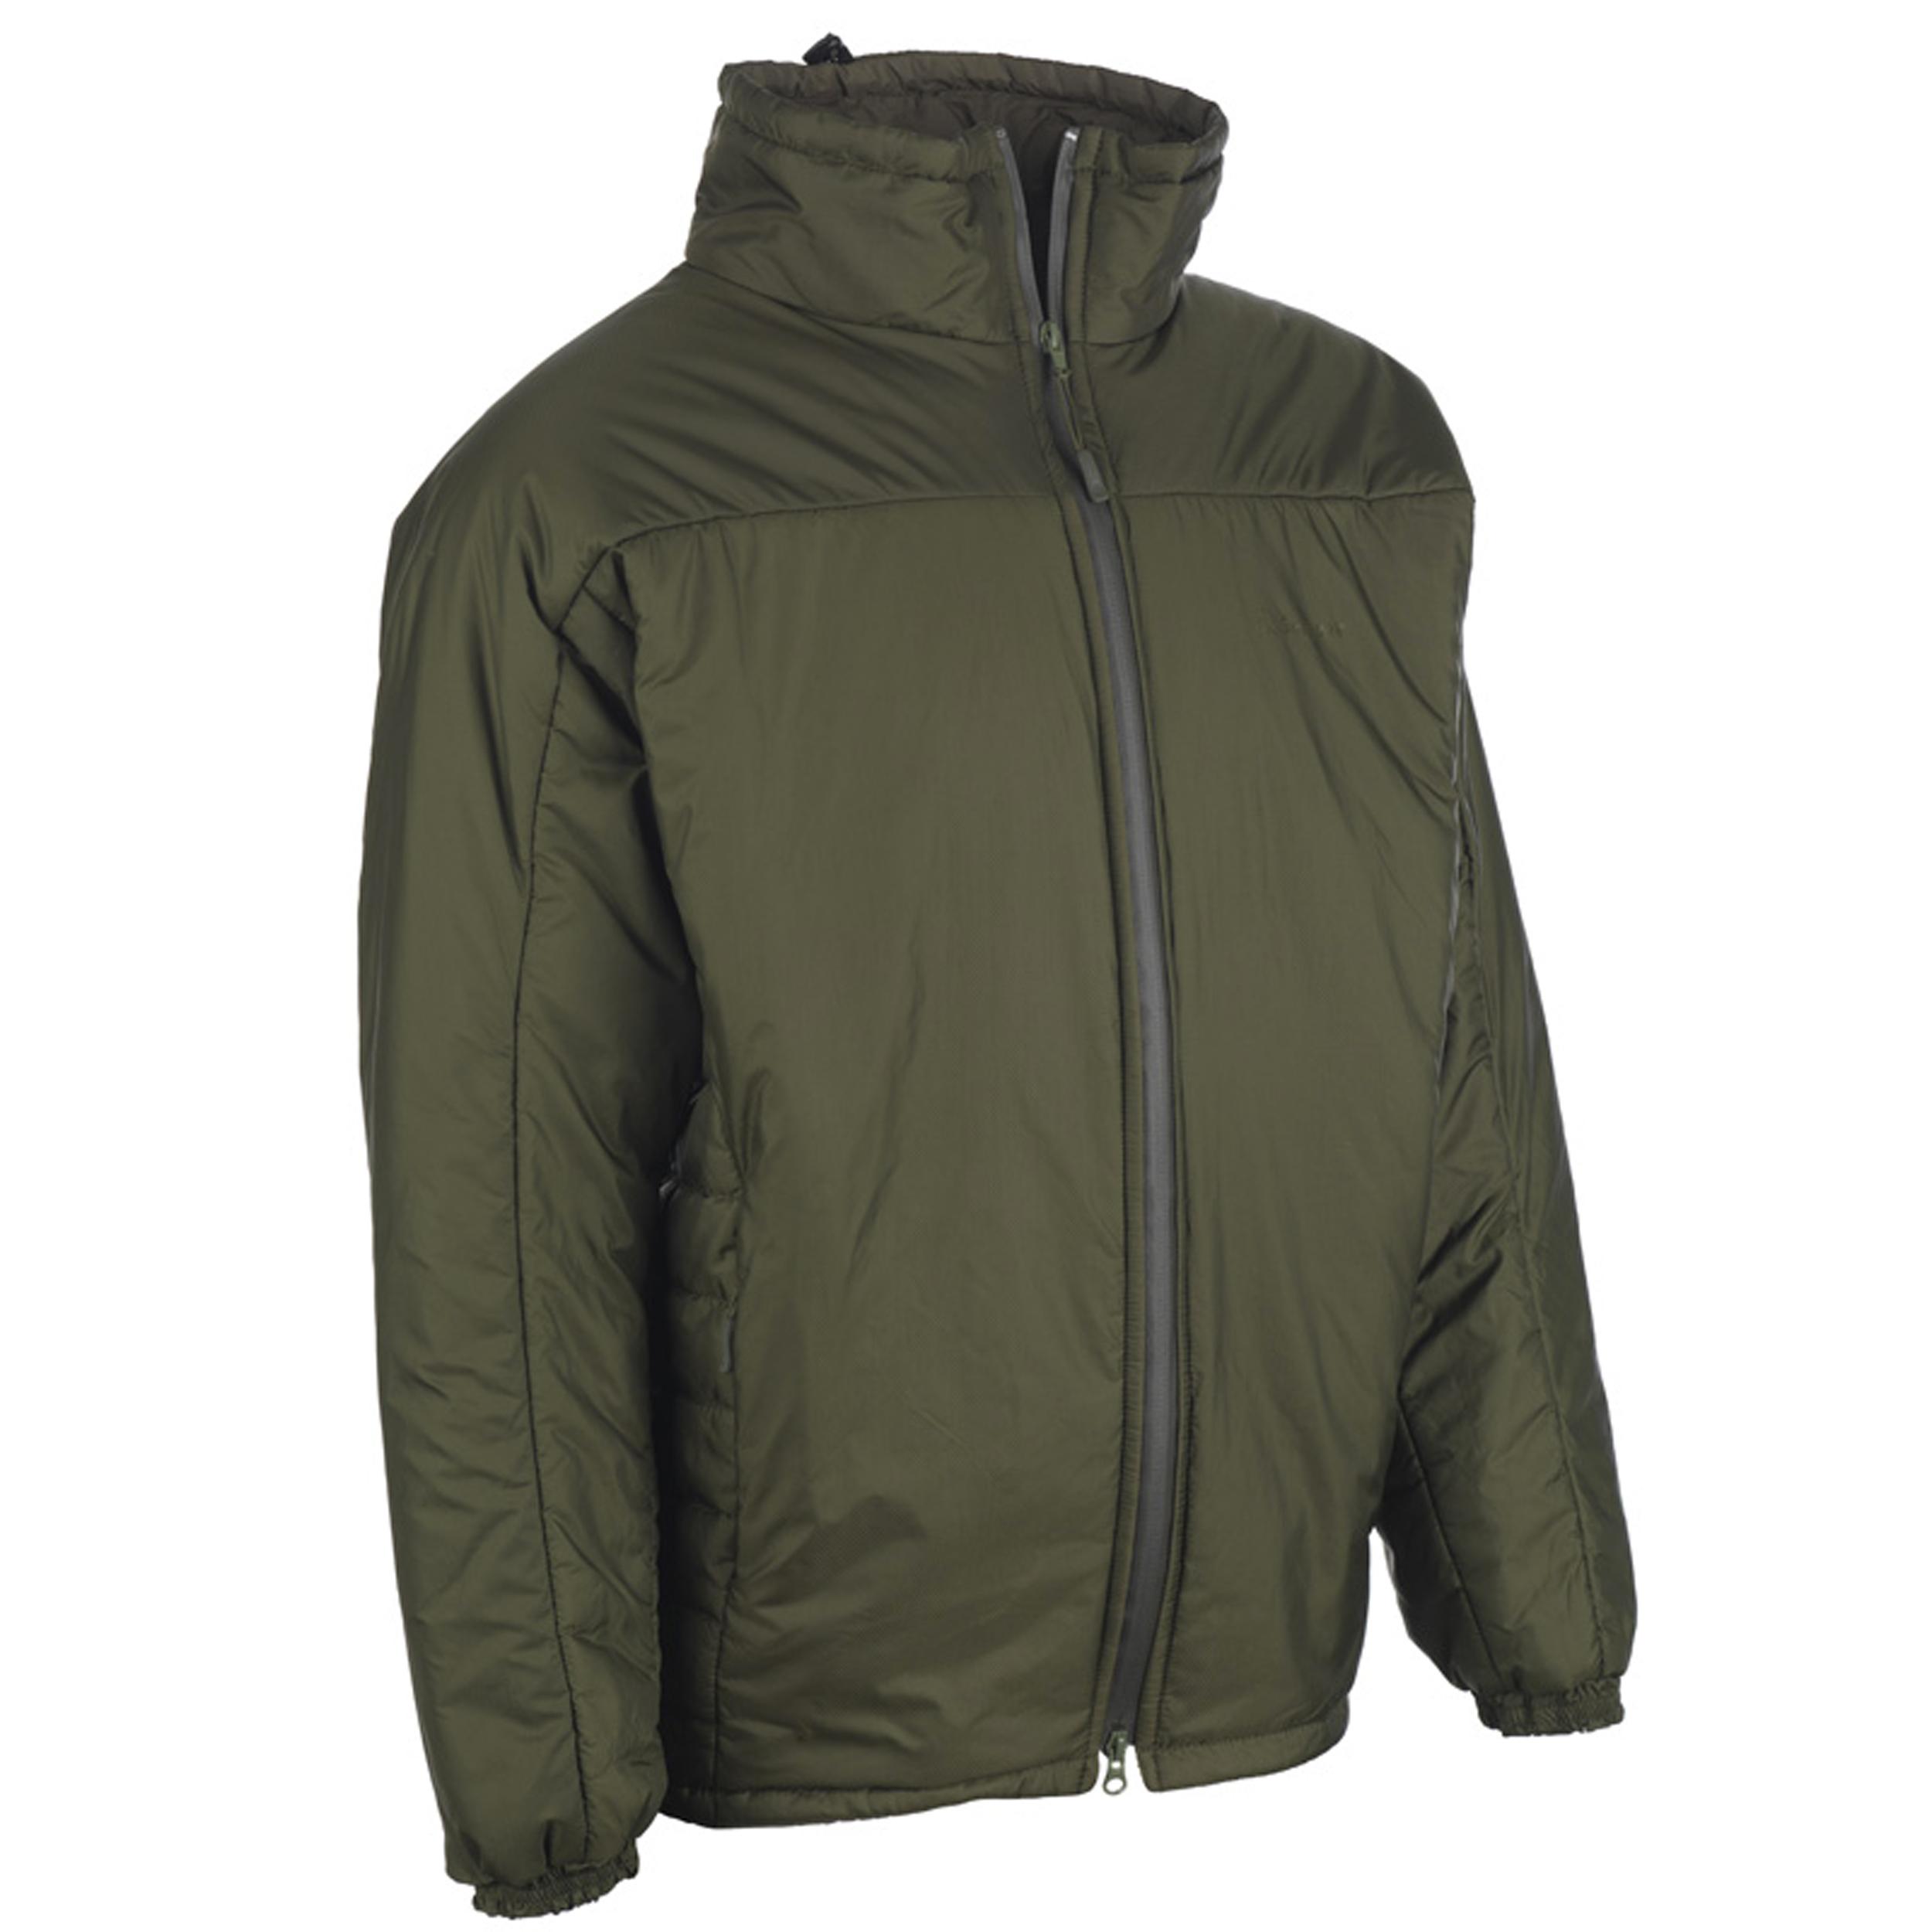 Snugpak Sj9 Jacket Olive Xxl